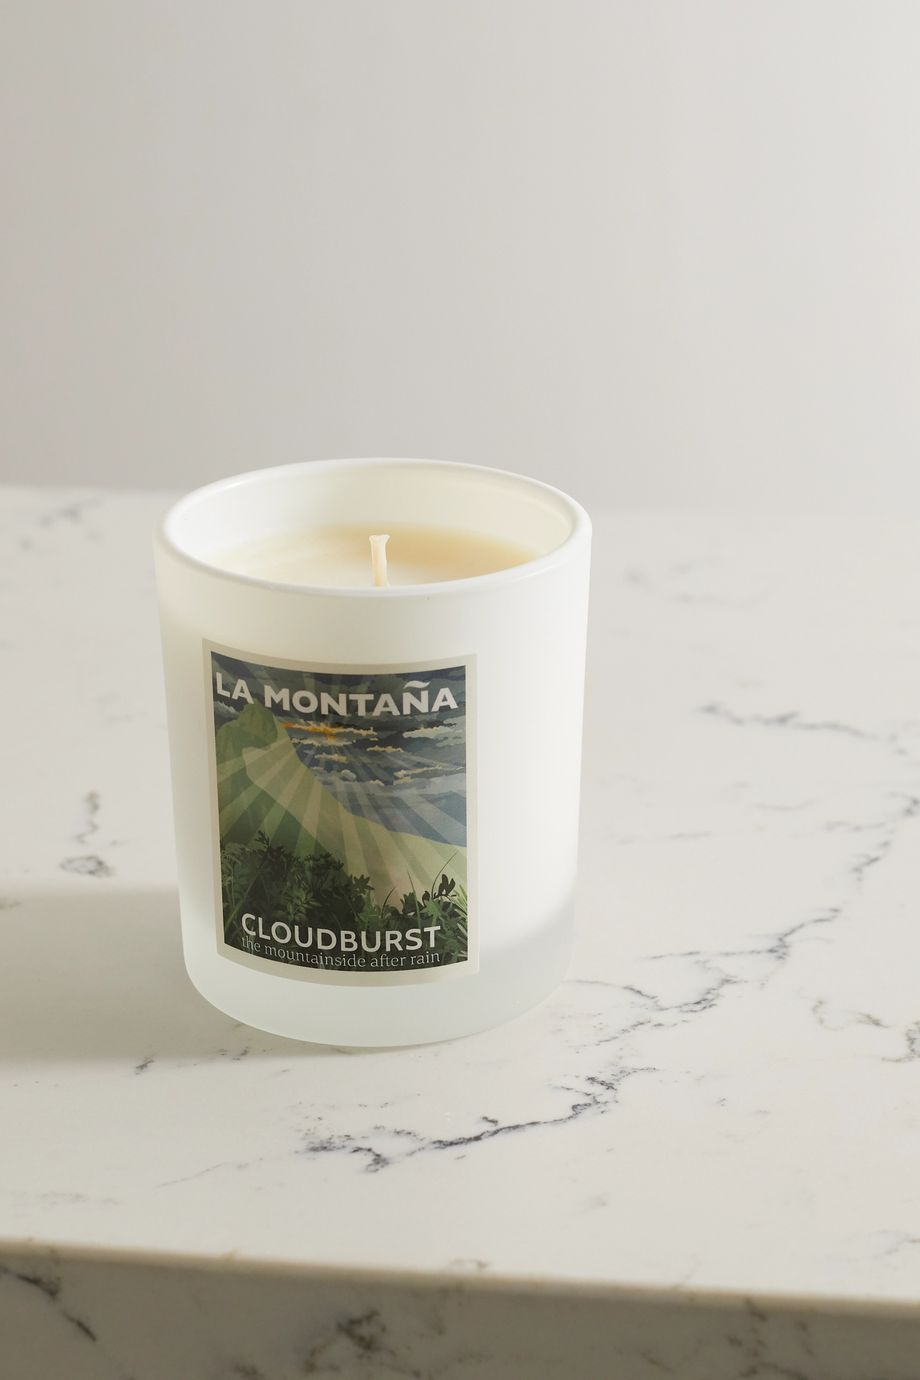 La Montaña Cloudburst Duftkerze, 220 g